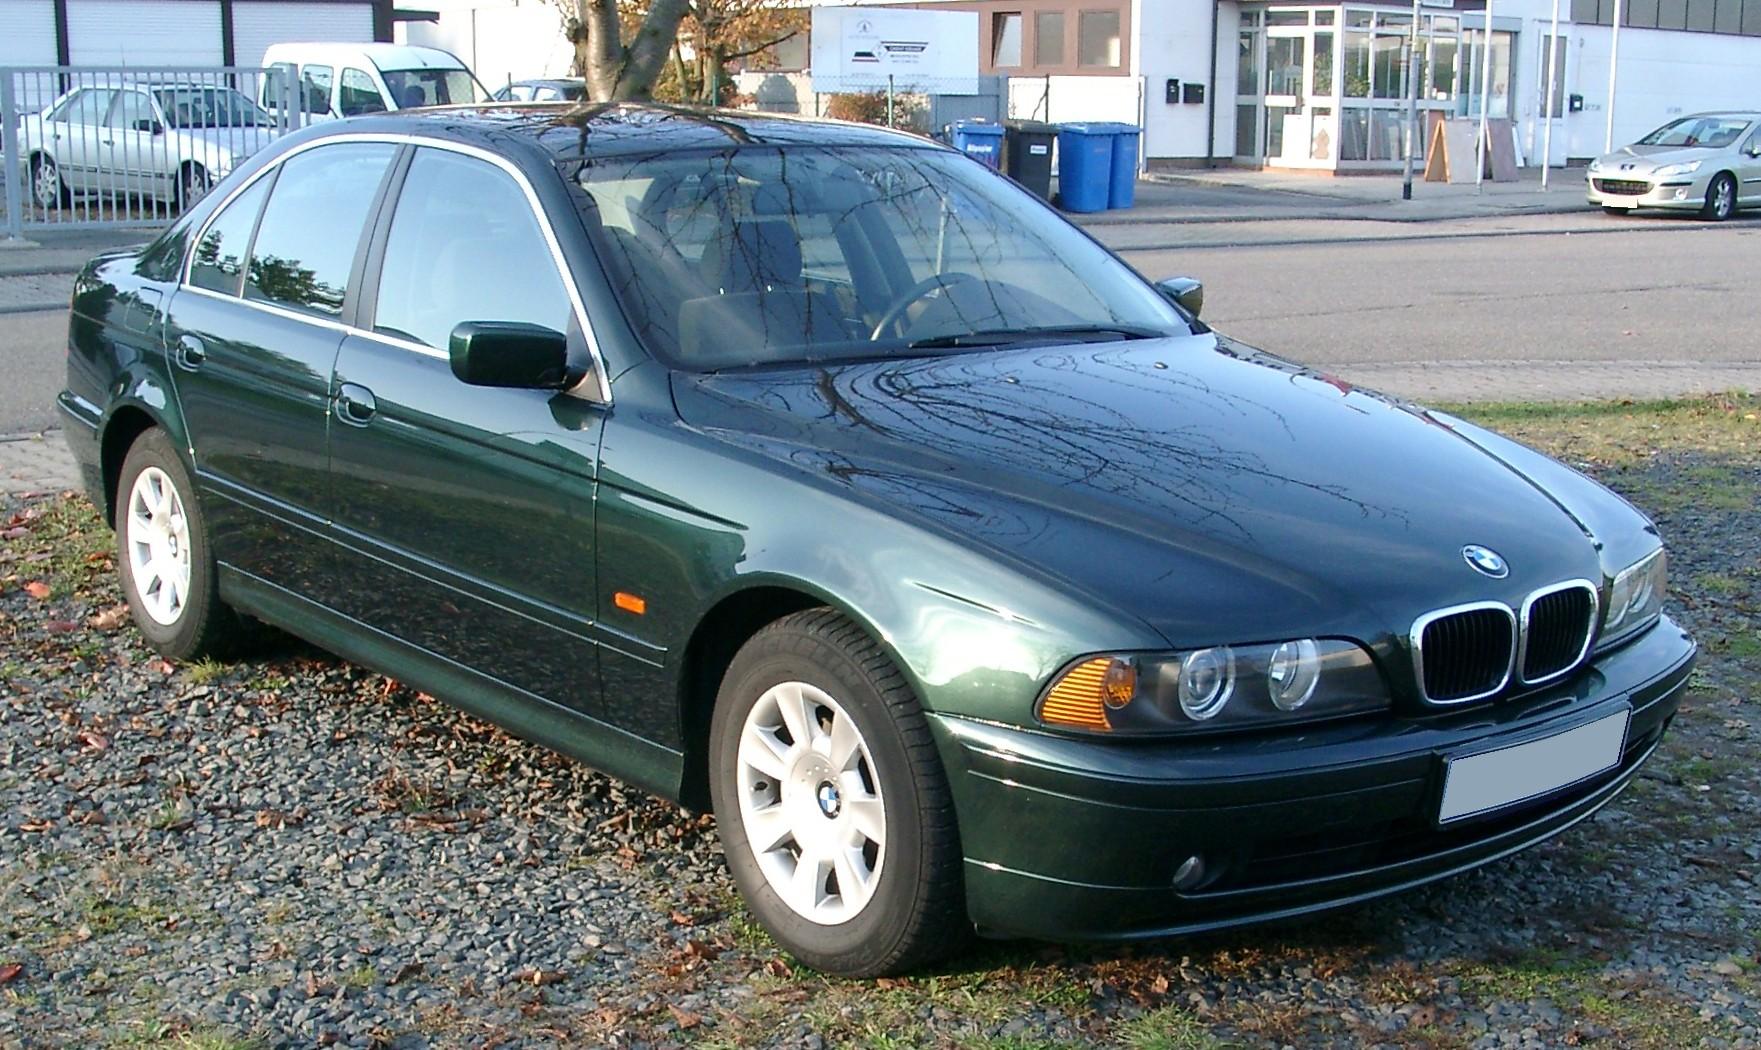 BMW 5 Series (E39) - Wikipedia